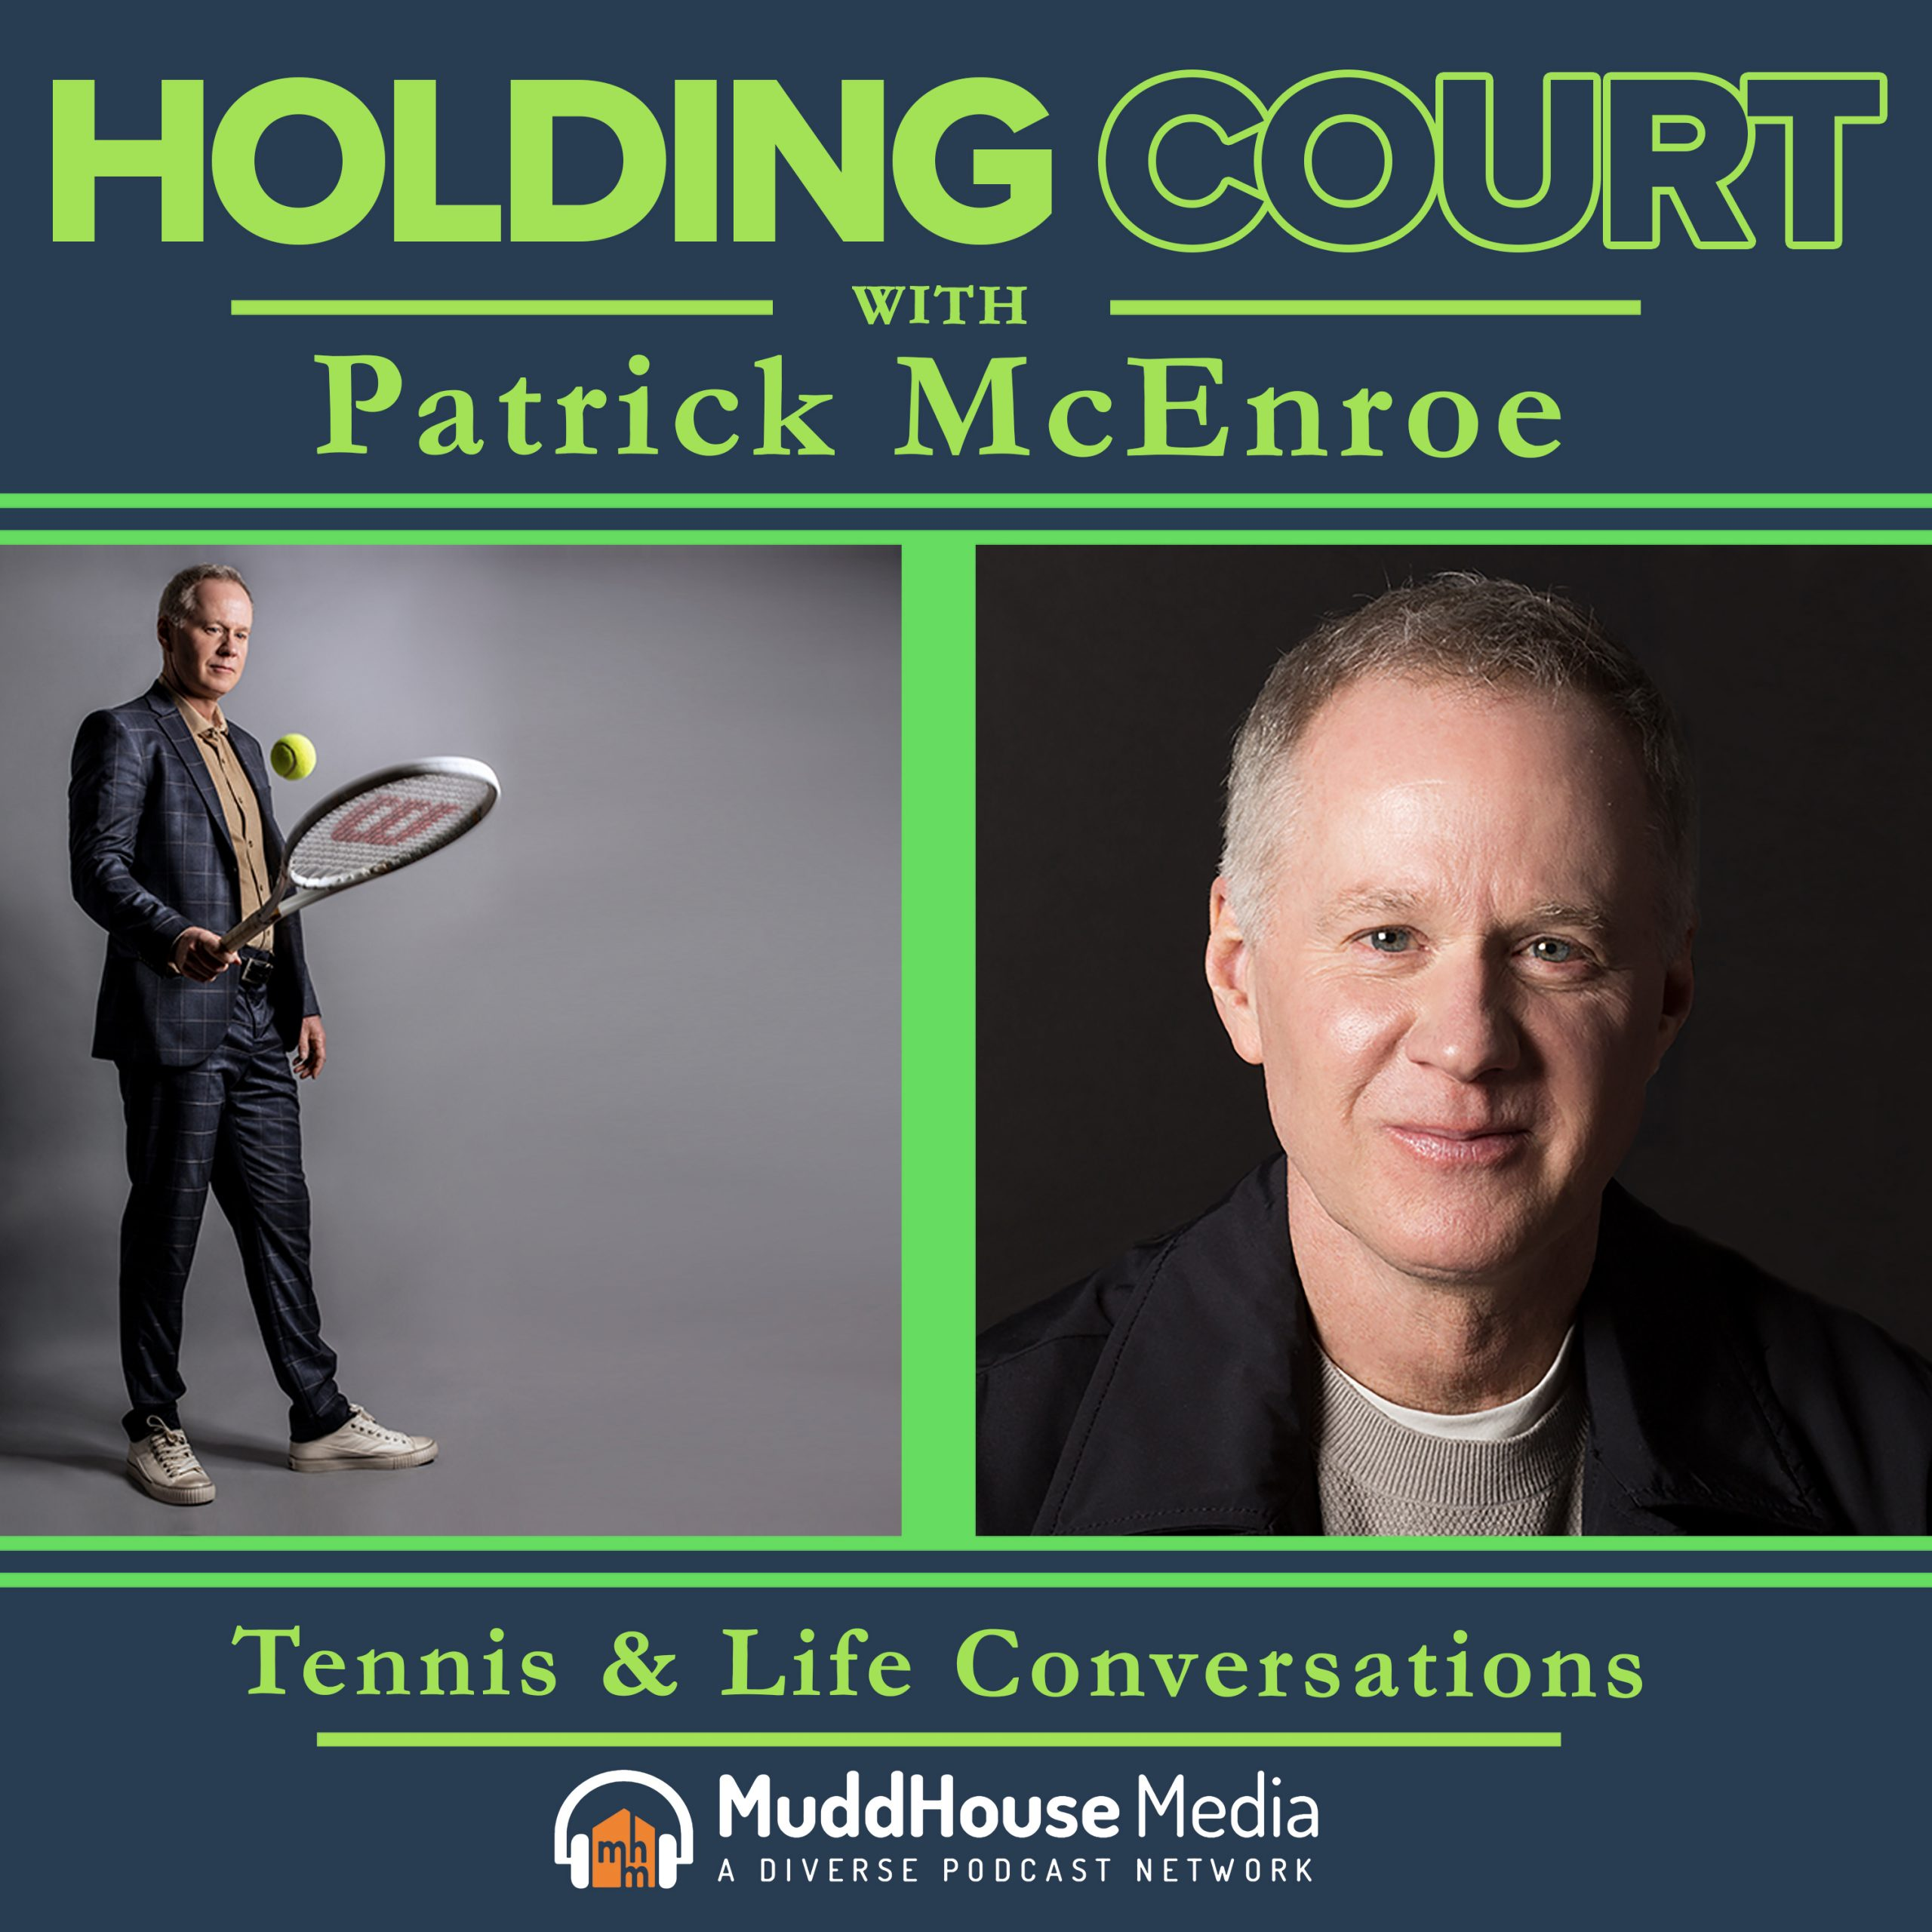 Holding Court with Patrick McEnroe